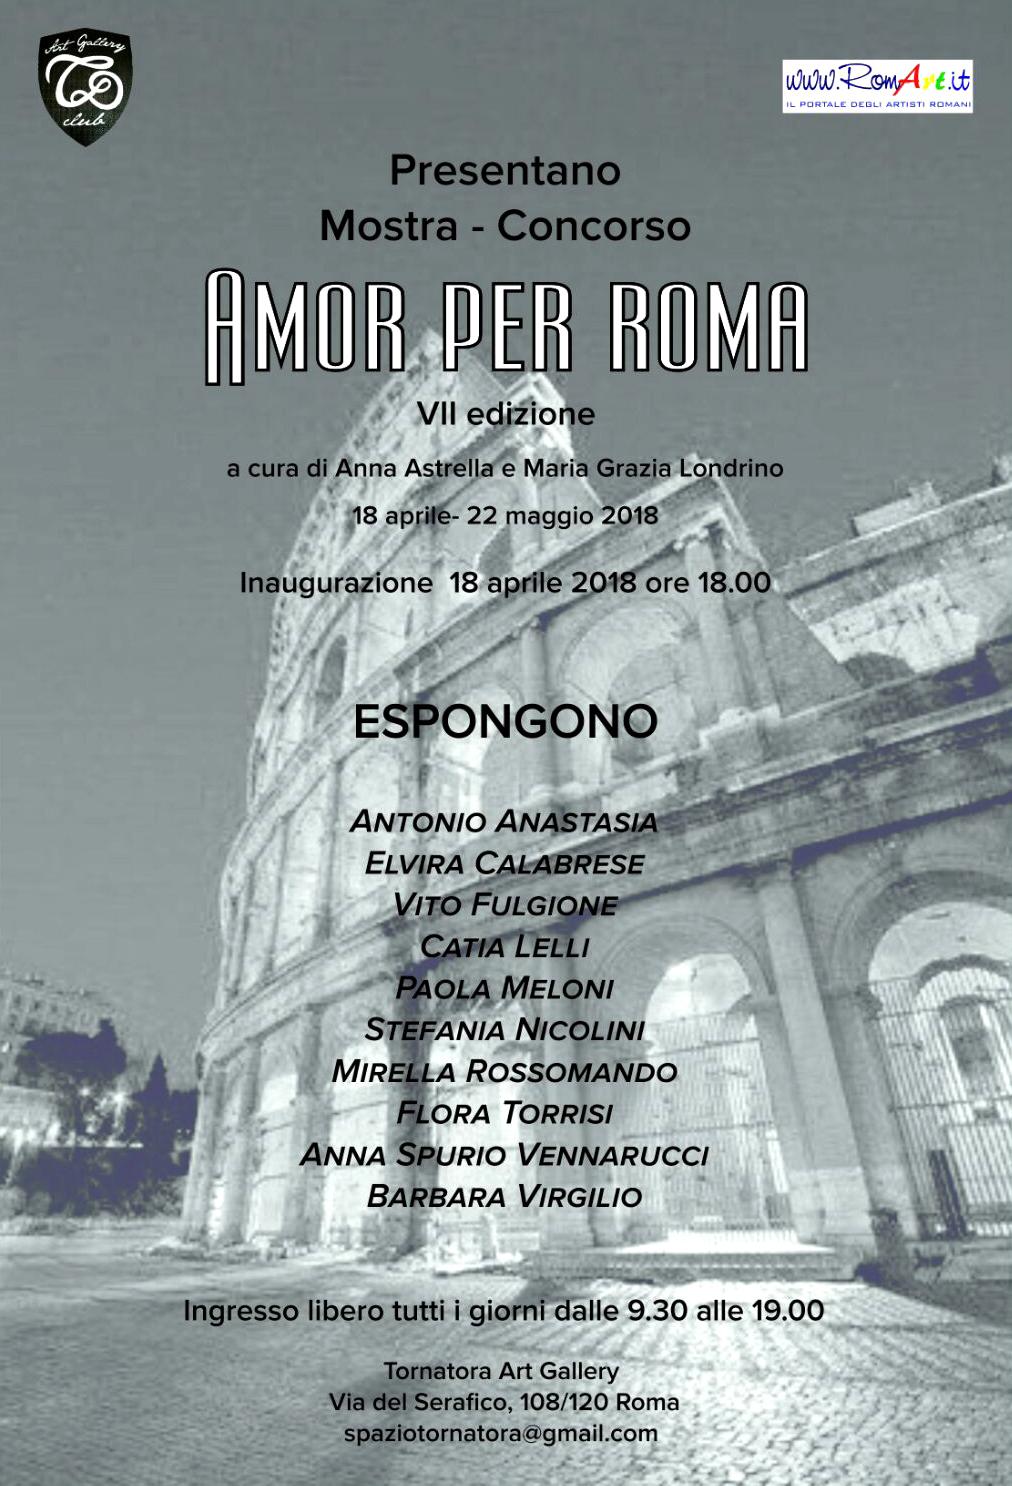 Amor per Roma - Barbara Virgilio